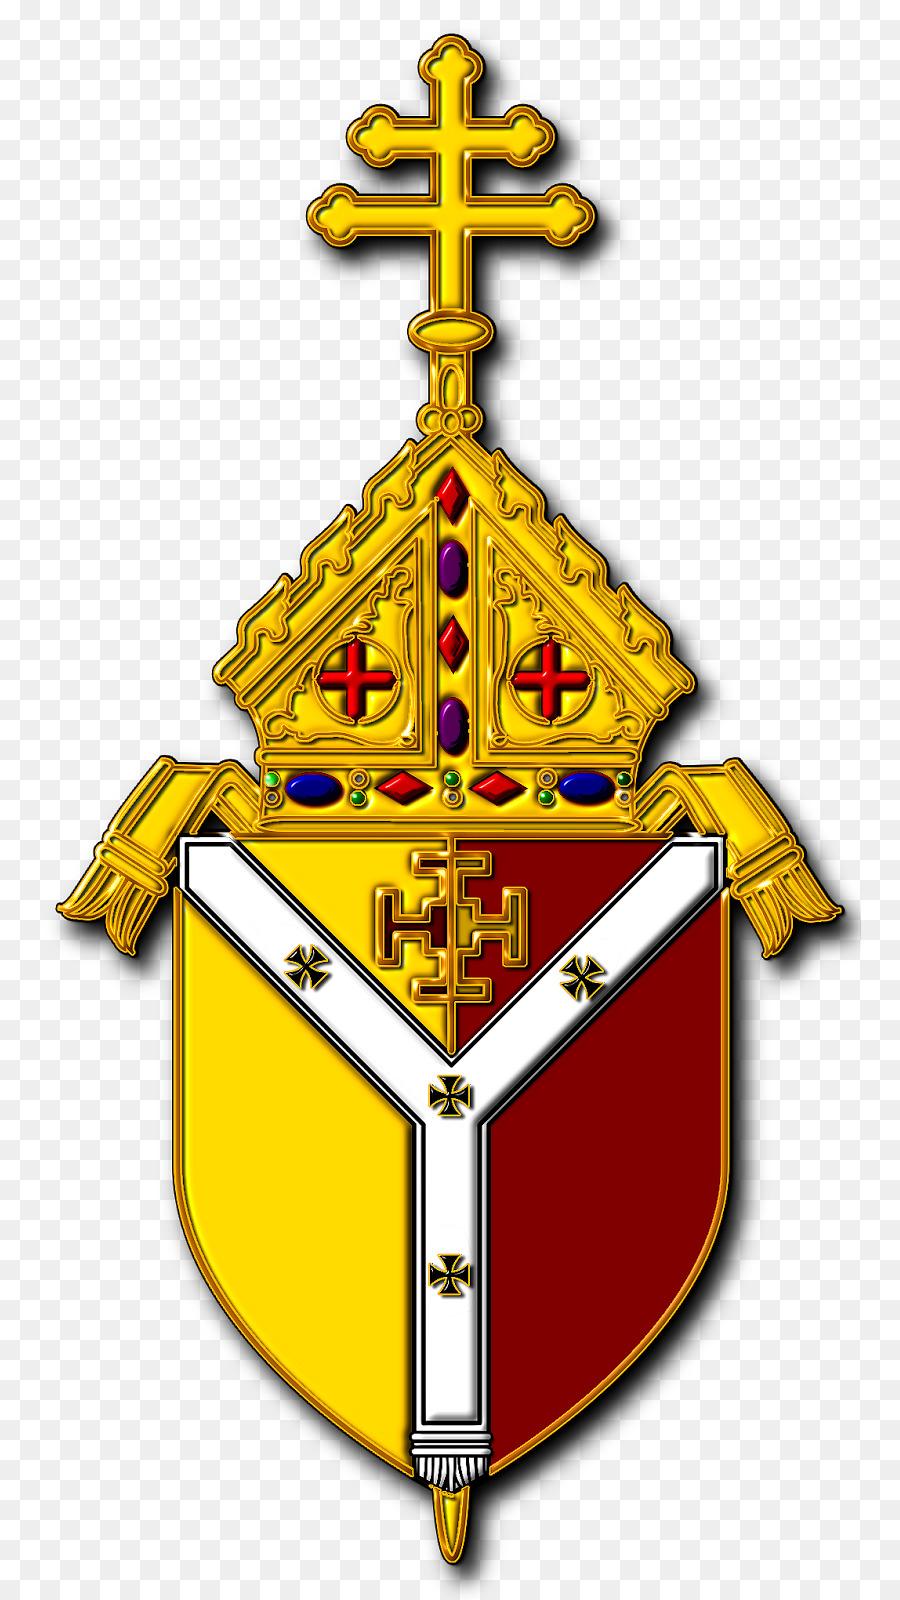 Diocese of spokane